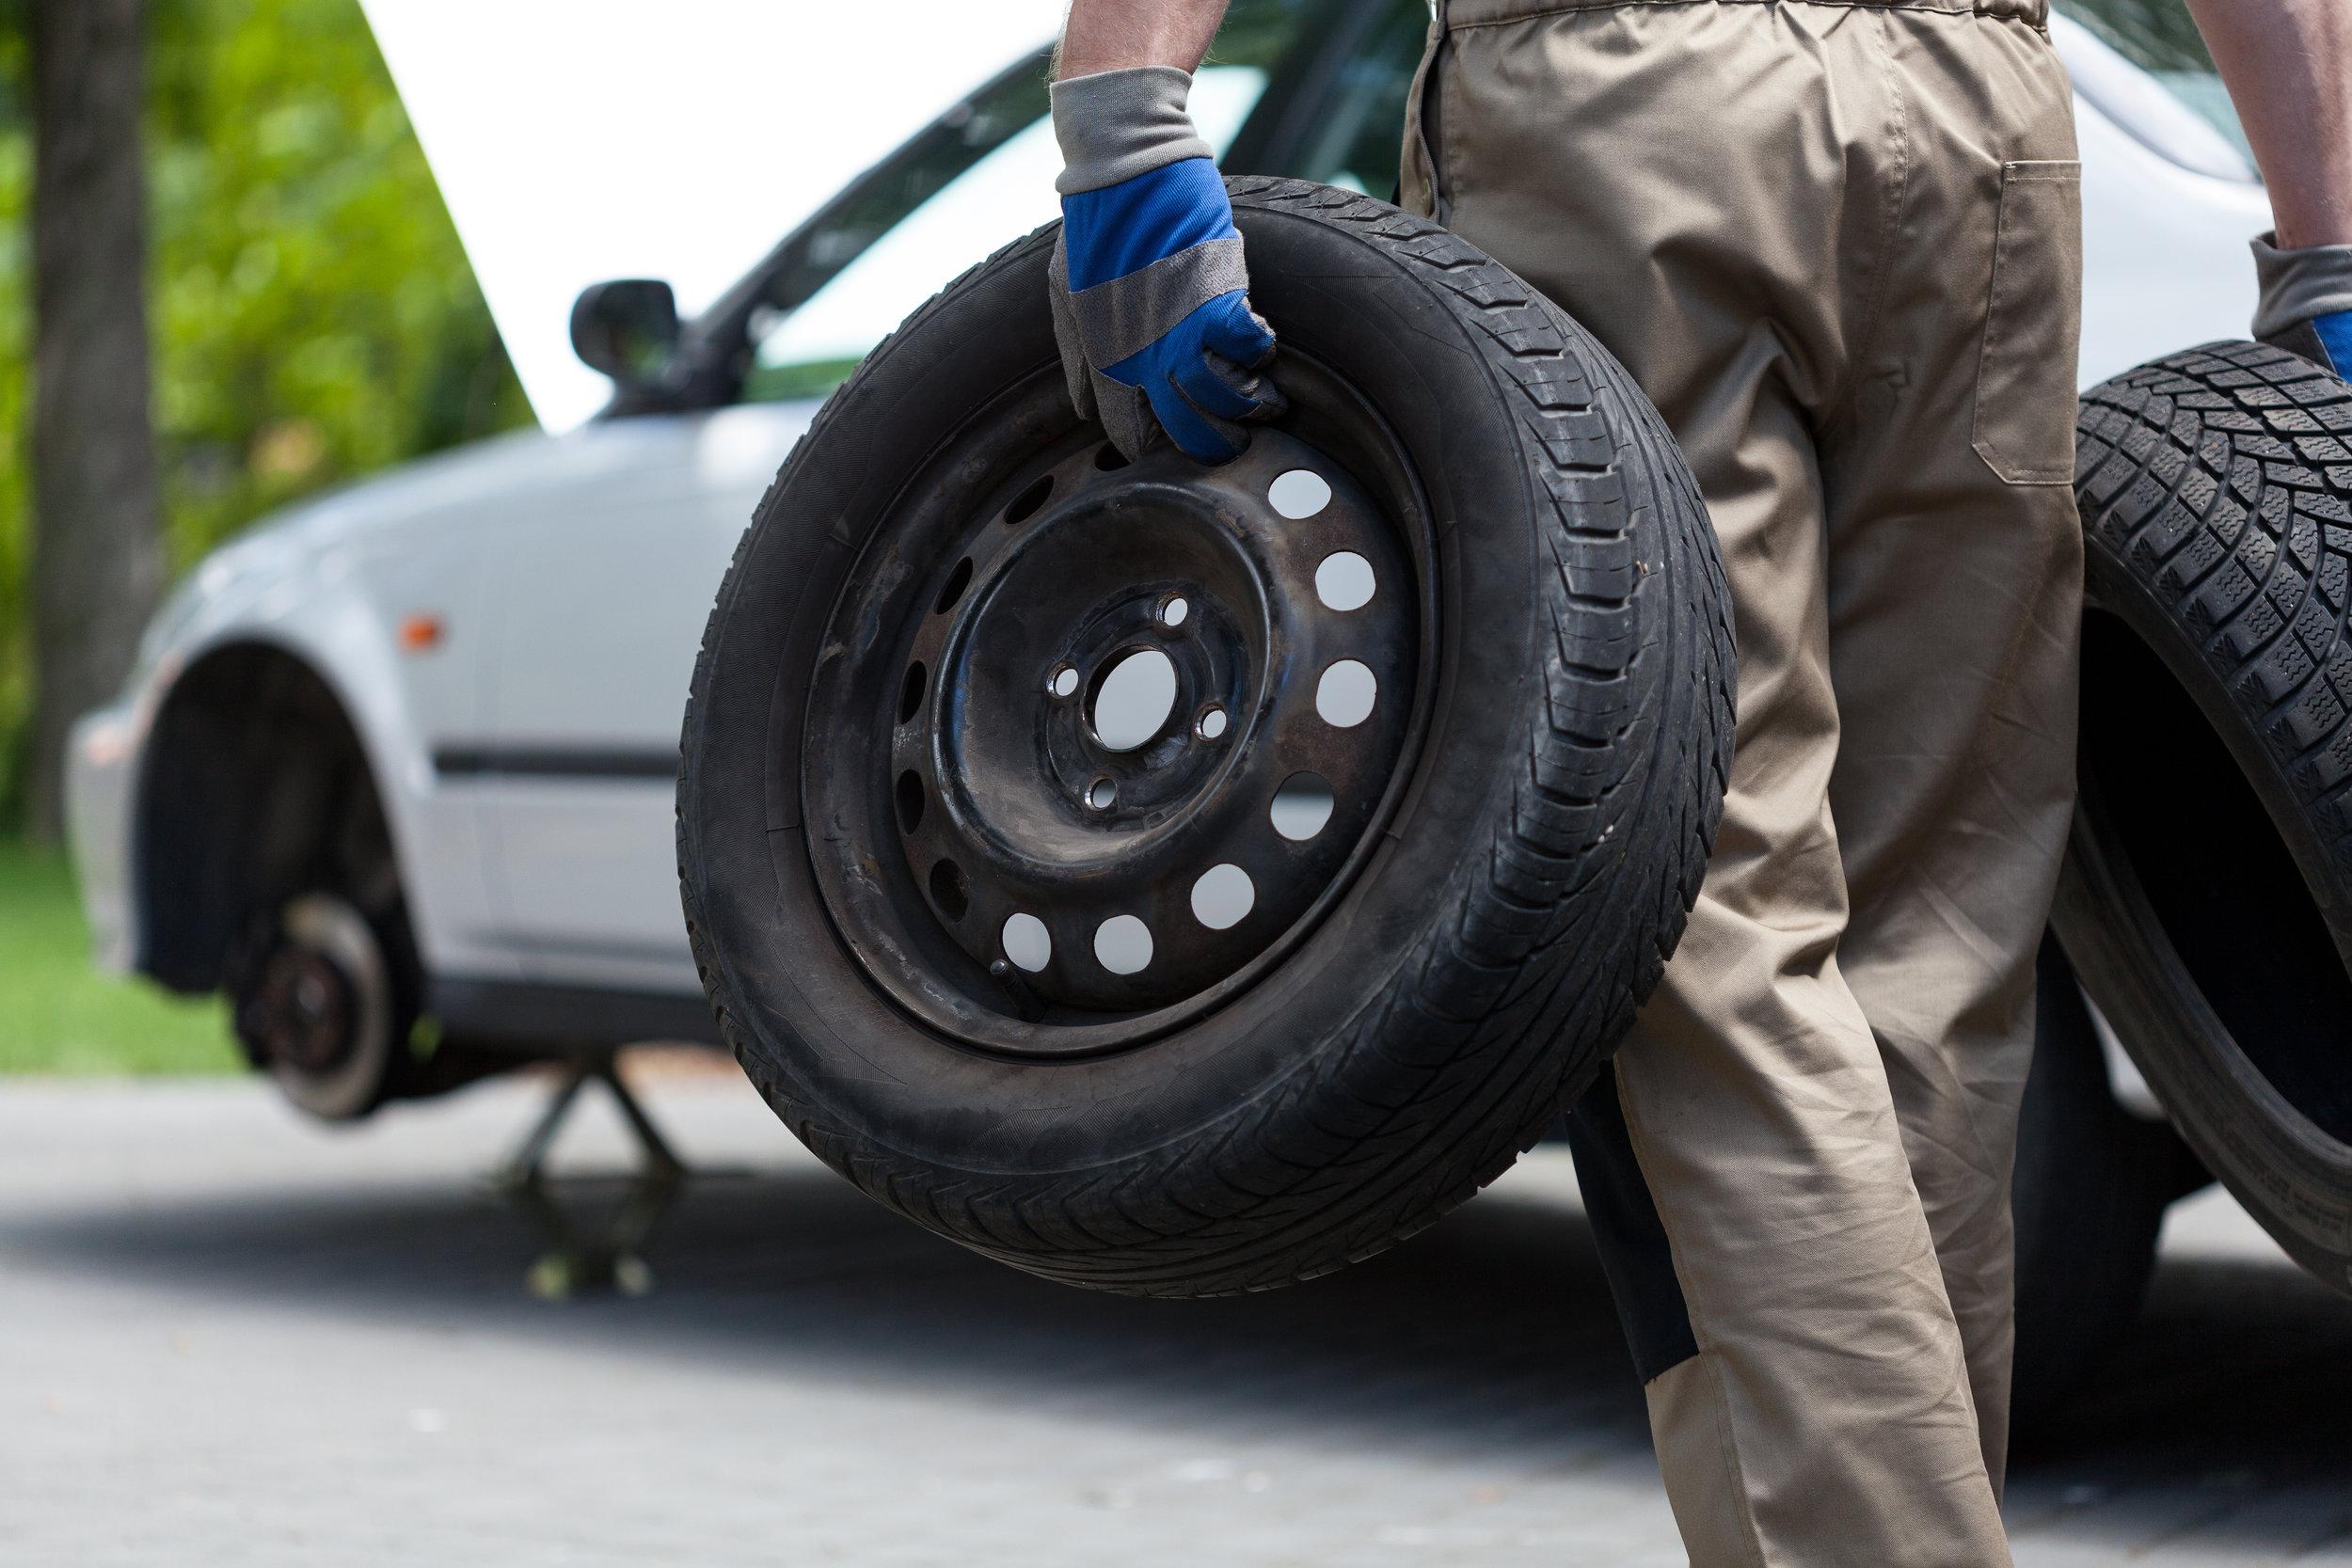 San Antonio Roadside Assistance - Flat Tire Assistance